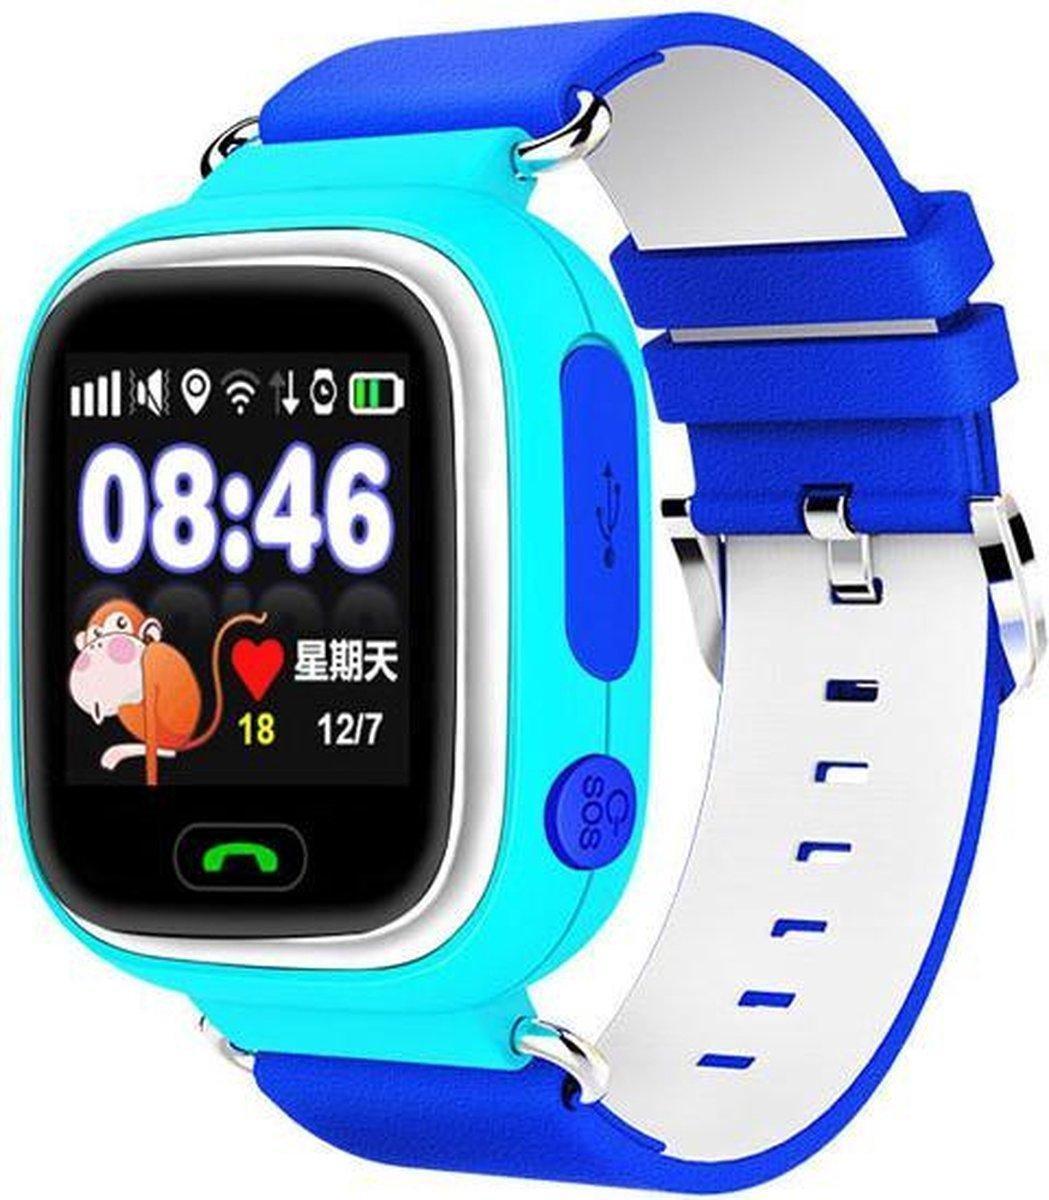 GPS Horloge Kind WBTT® - GPS Tracker Kind - Blauw - GPS Horloge kinderen